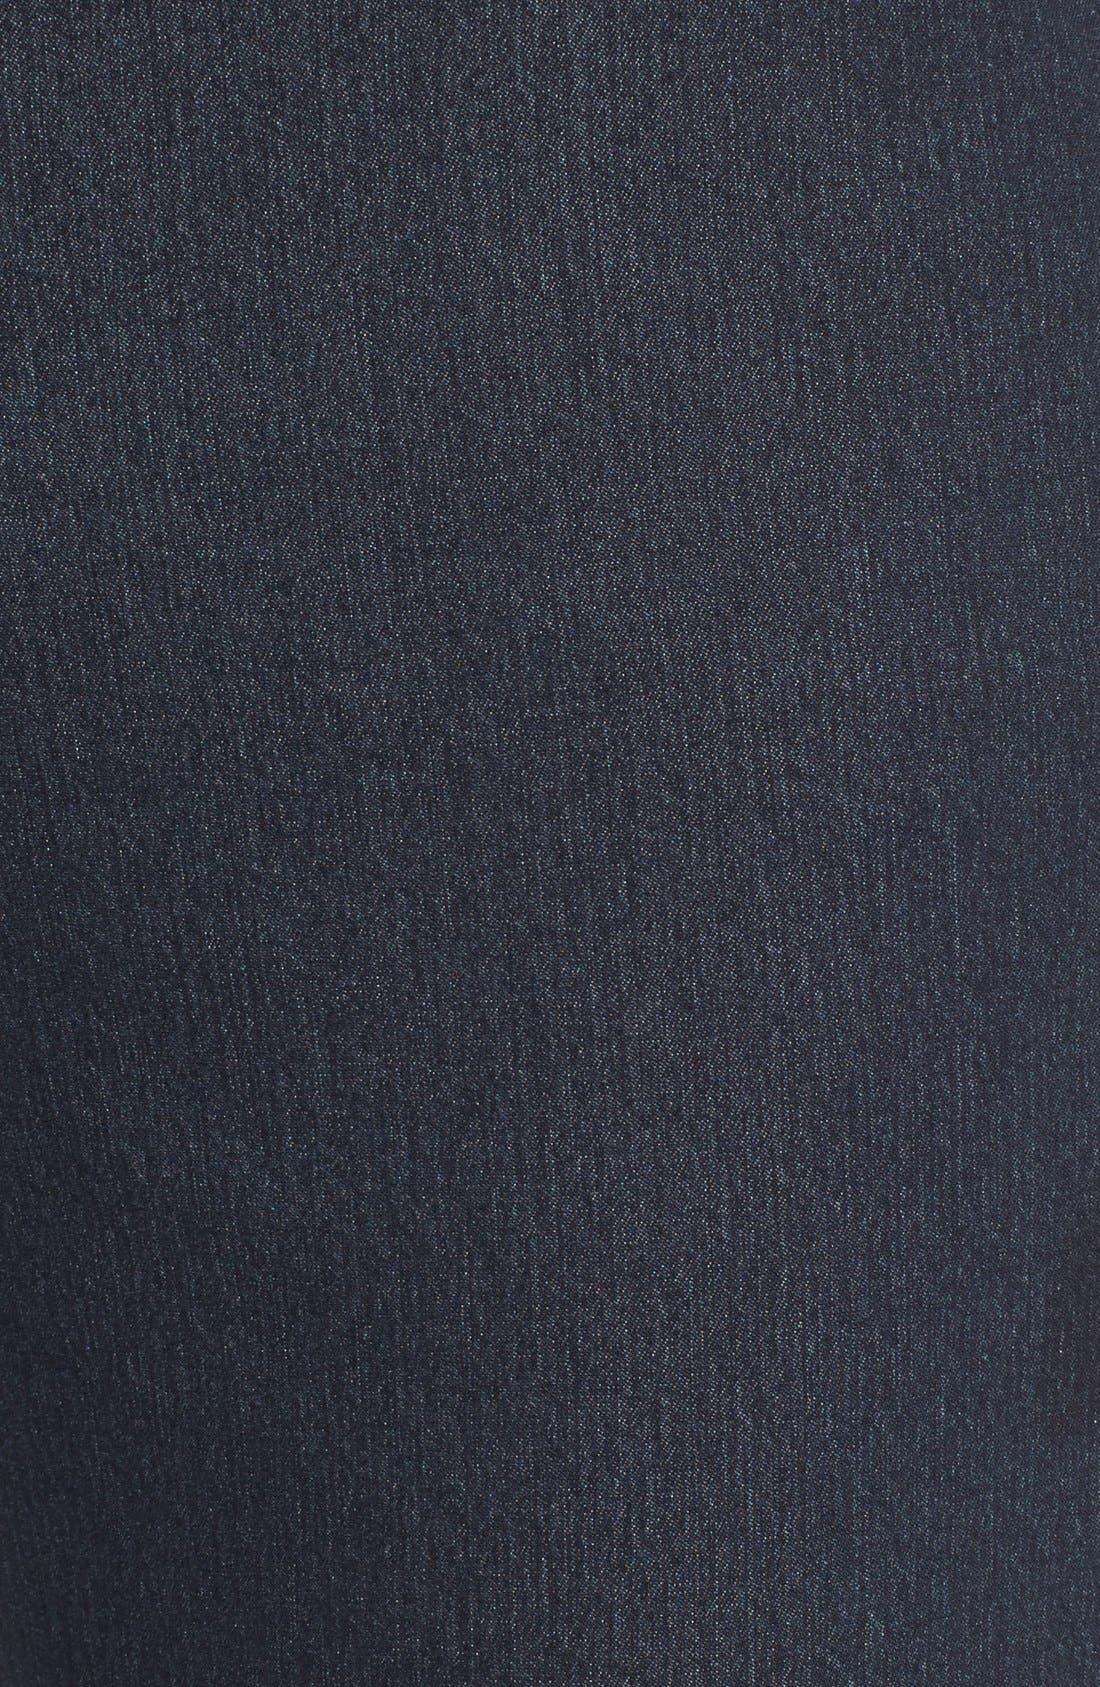 Alternate Image 3  - Lafayette 148 New York 'Primo Denim' Curvy Fit Slim Leg Jeans